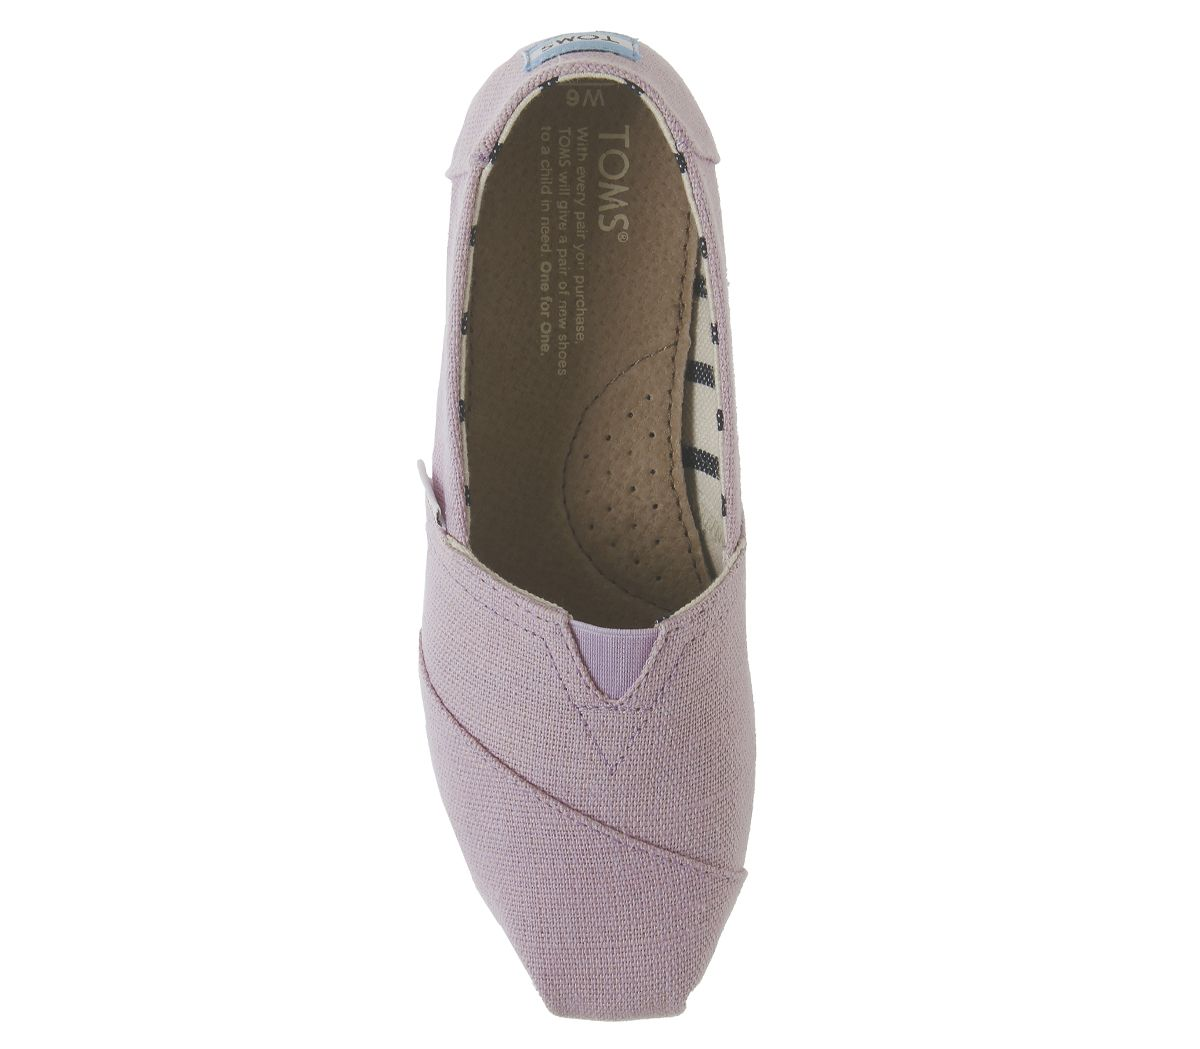 Womens-Toms-Seasonal-Classic-Slip-On-Flats-Soft-Lilac-Flats thumbnail 13